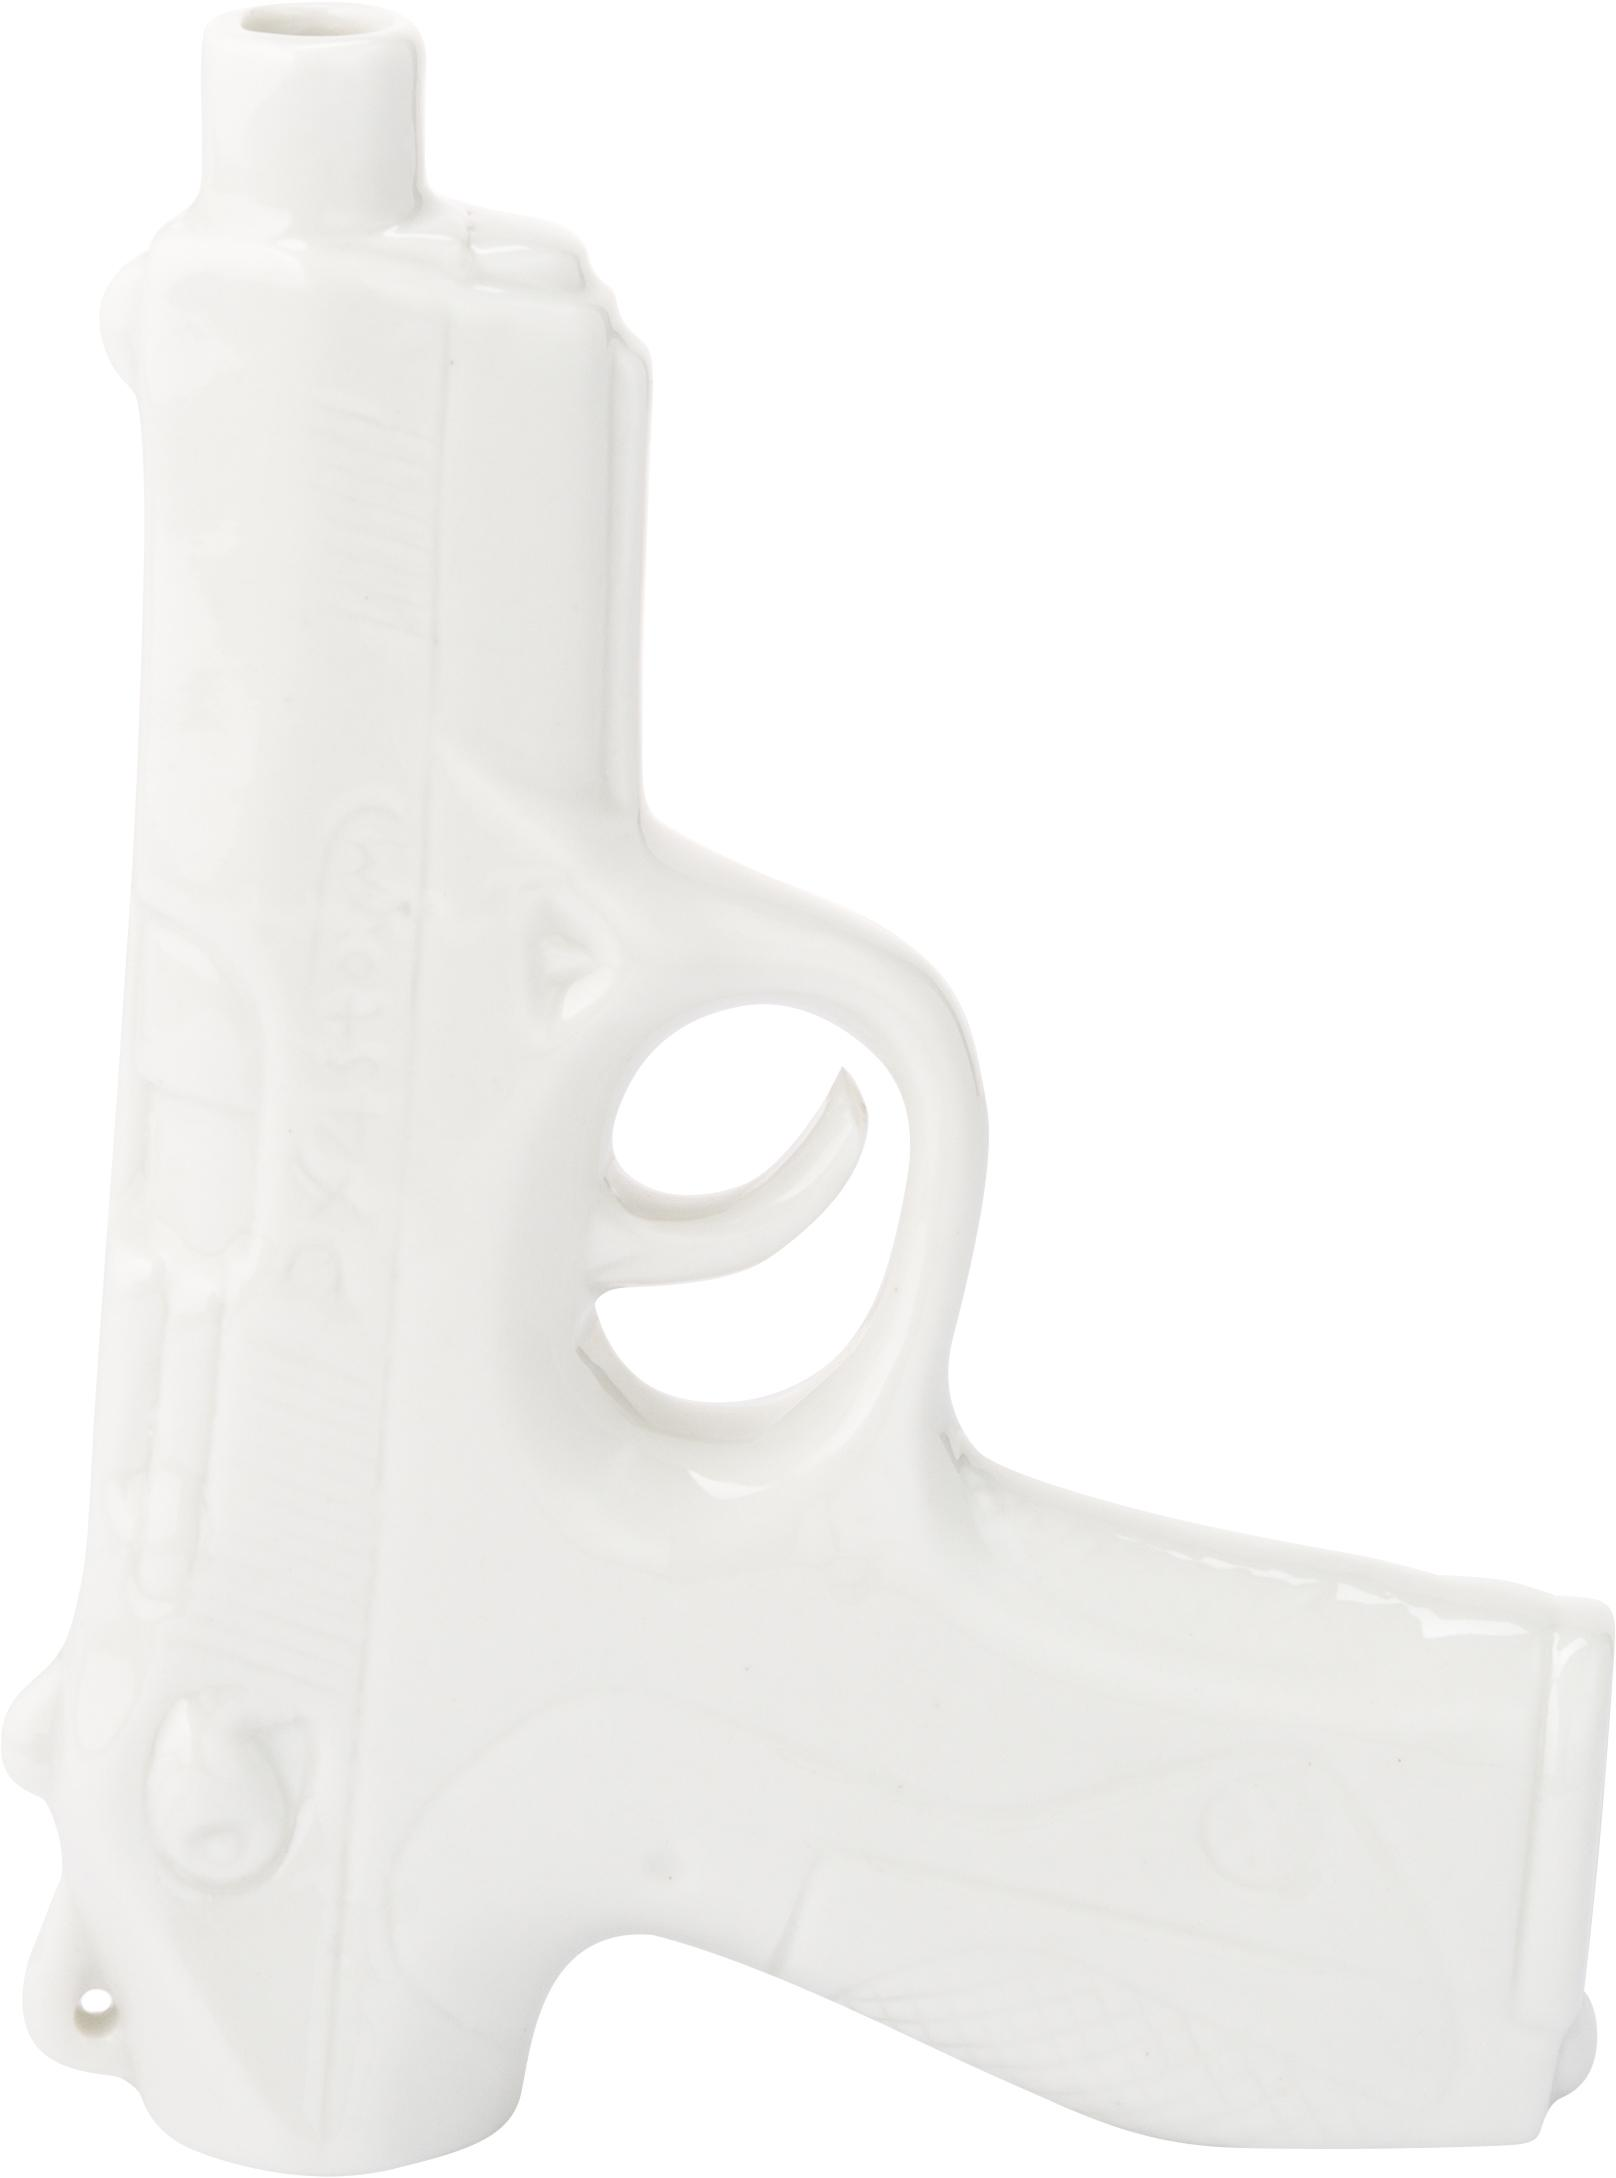 Vaso in porcellana Gun, Porcellana smaltata, Bianco, Larg. 12 x Alt. 17 cm